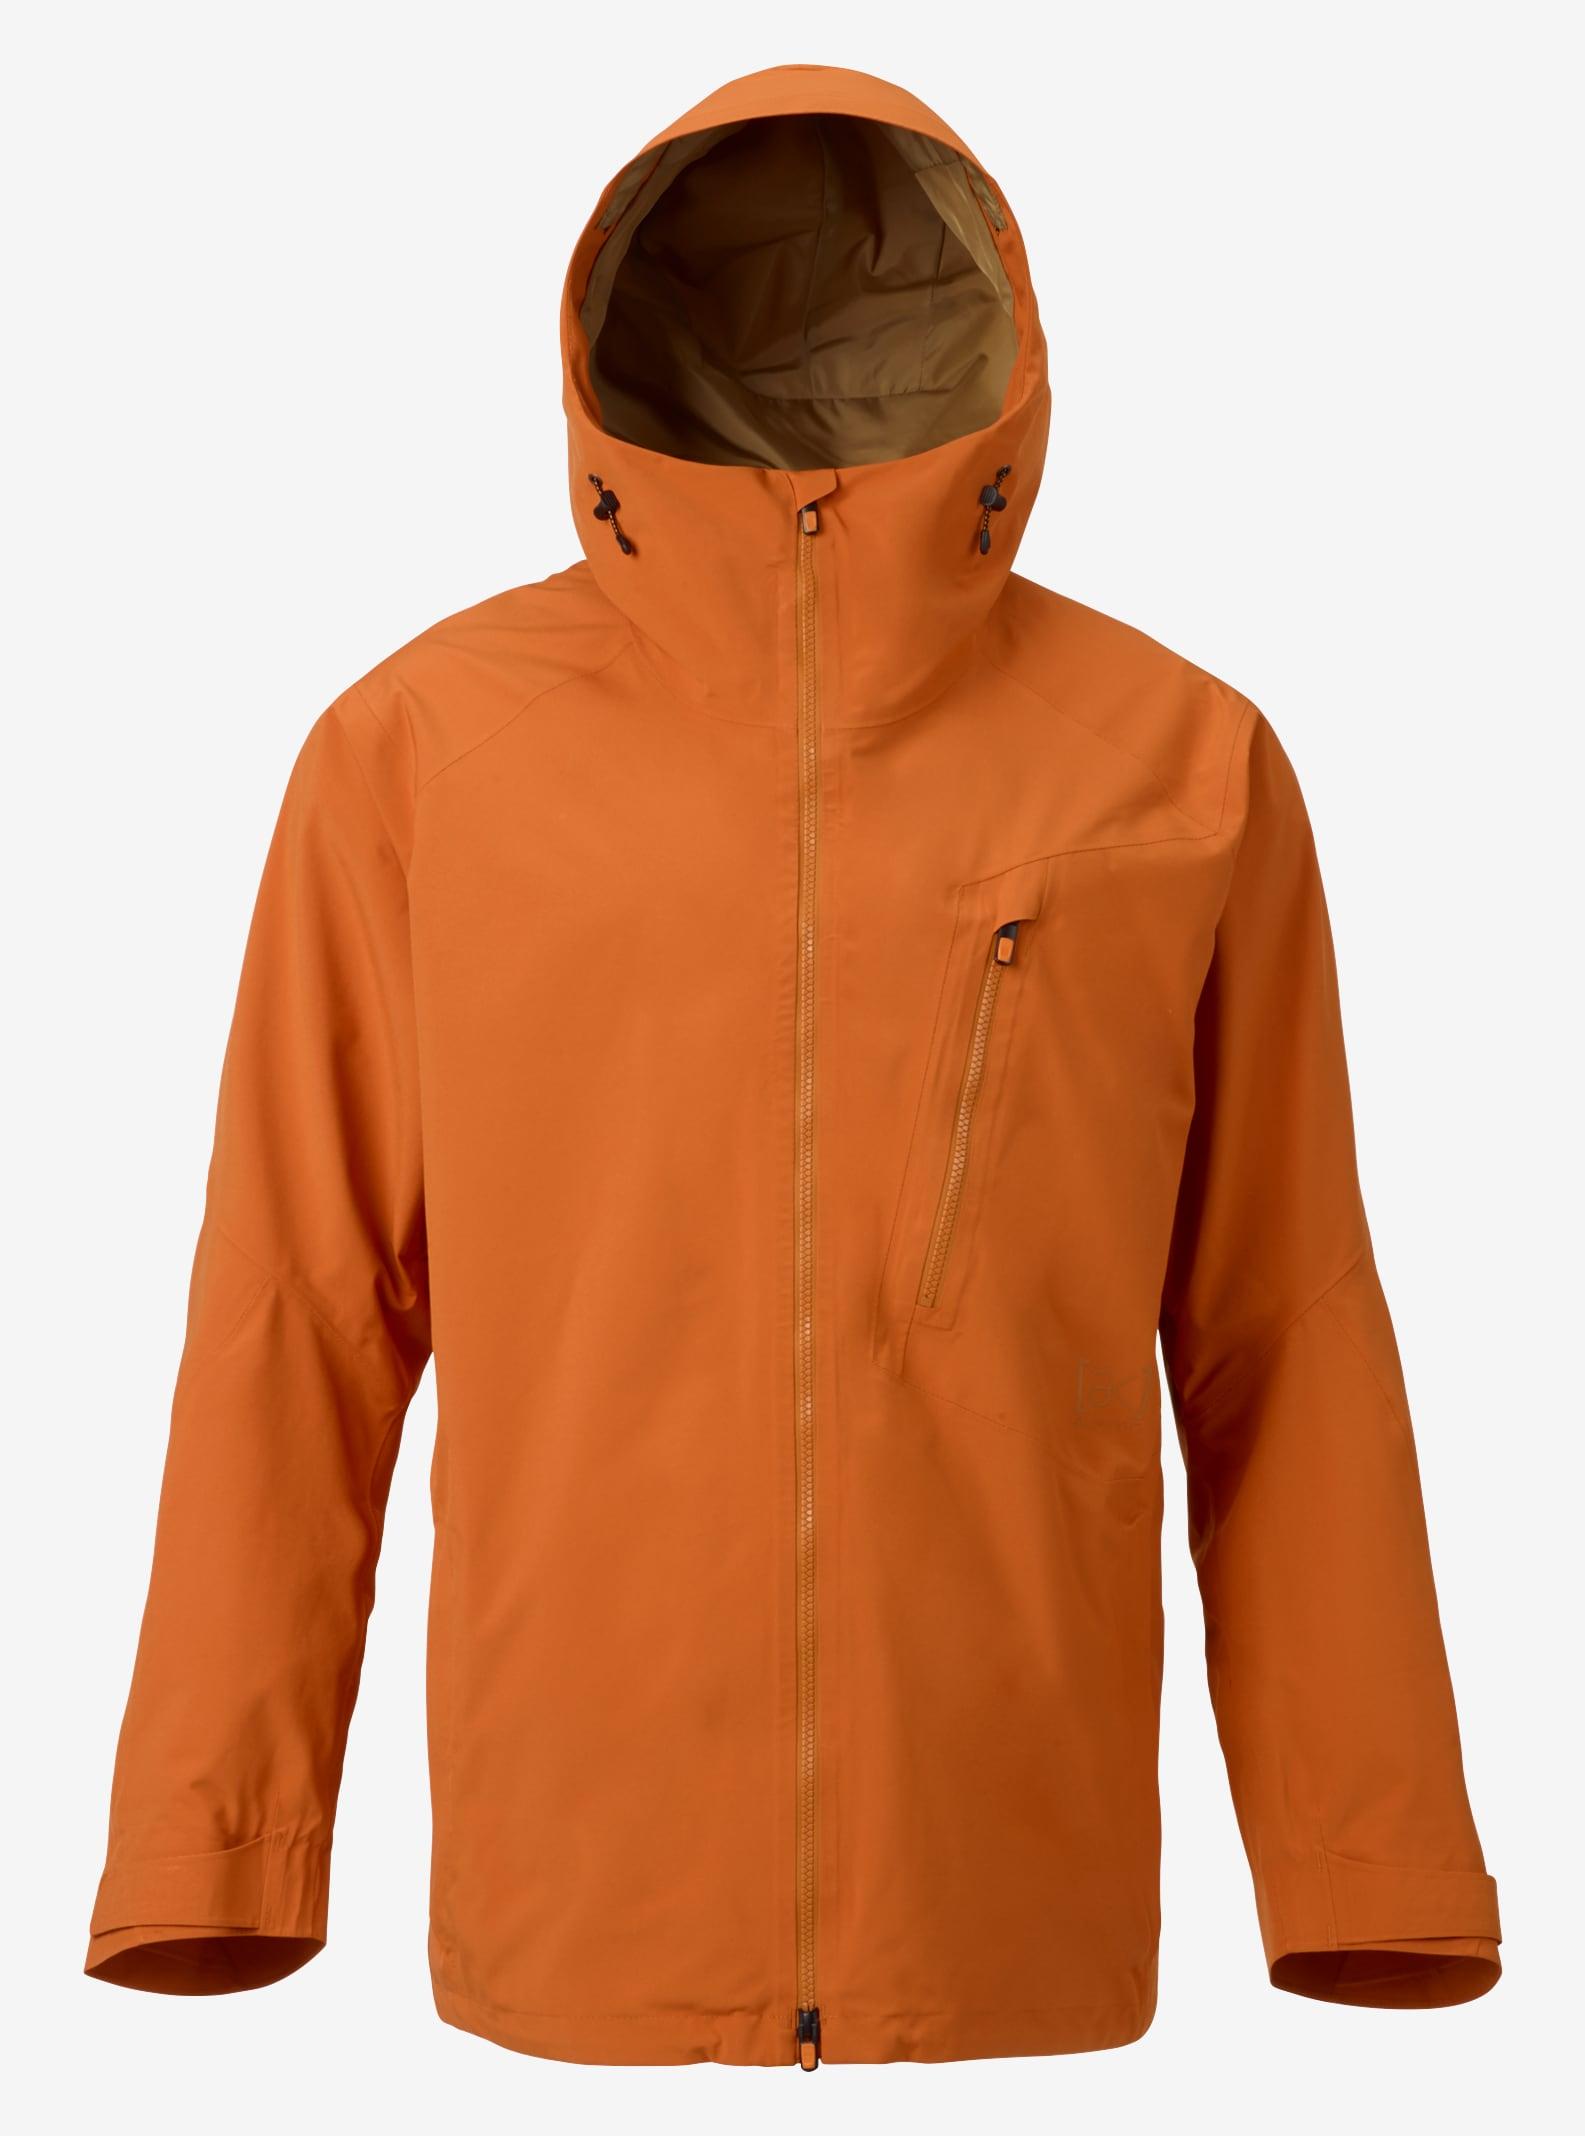 Men's Burton [ak] GORE‑TEX® Cyclic Jacket shown in Maui Sunset